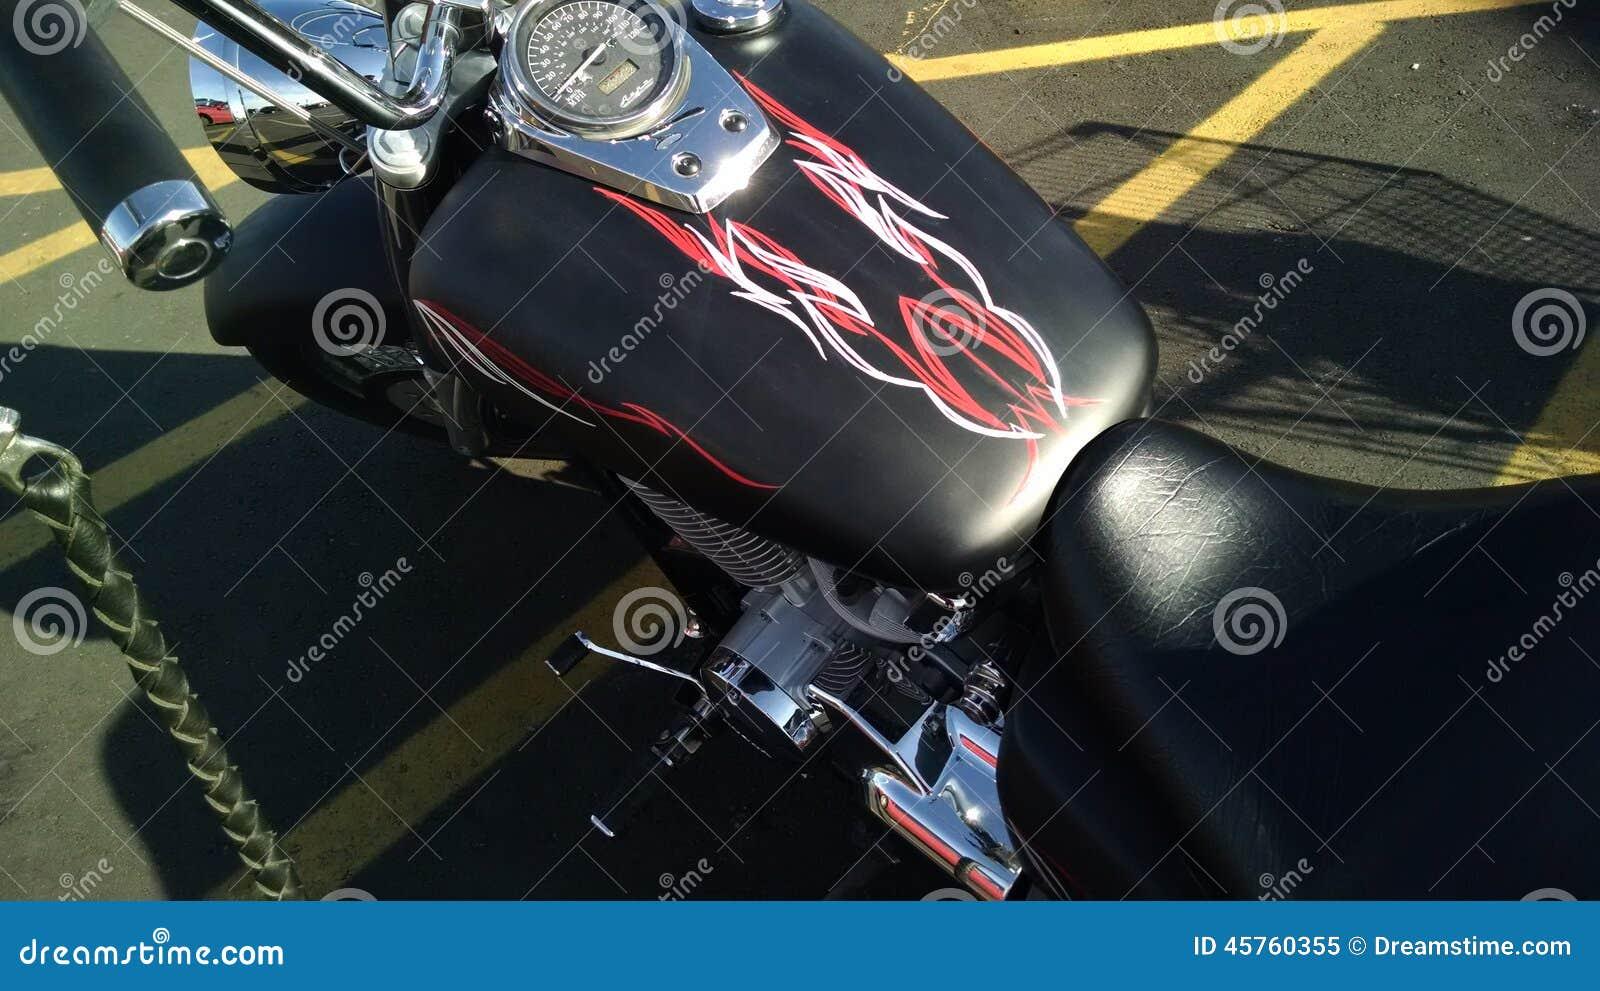 Satin black motorcycle paint job